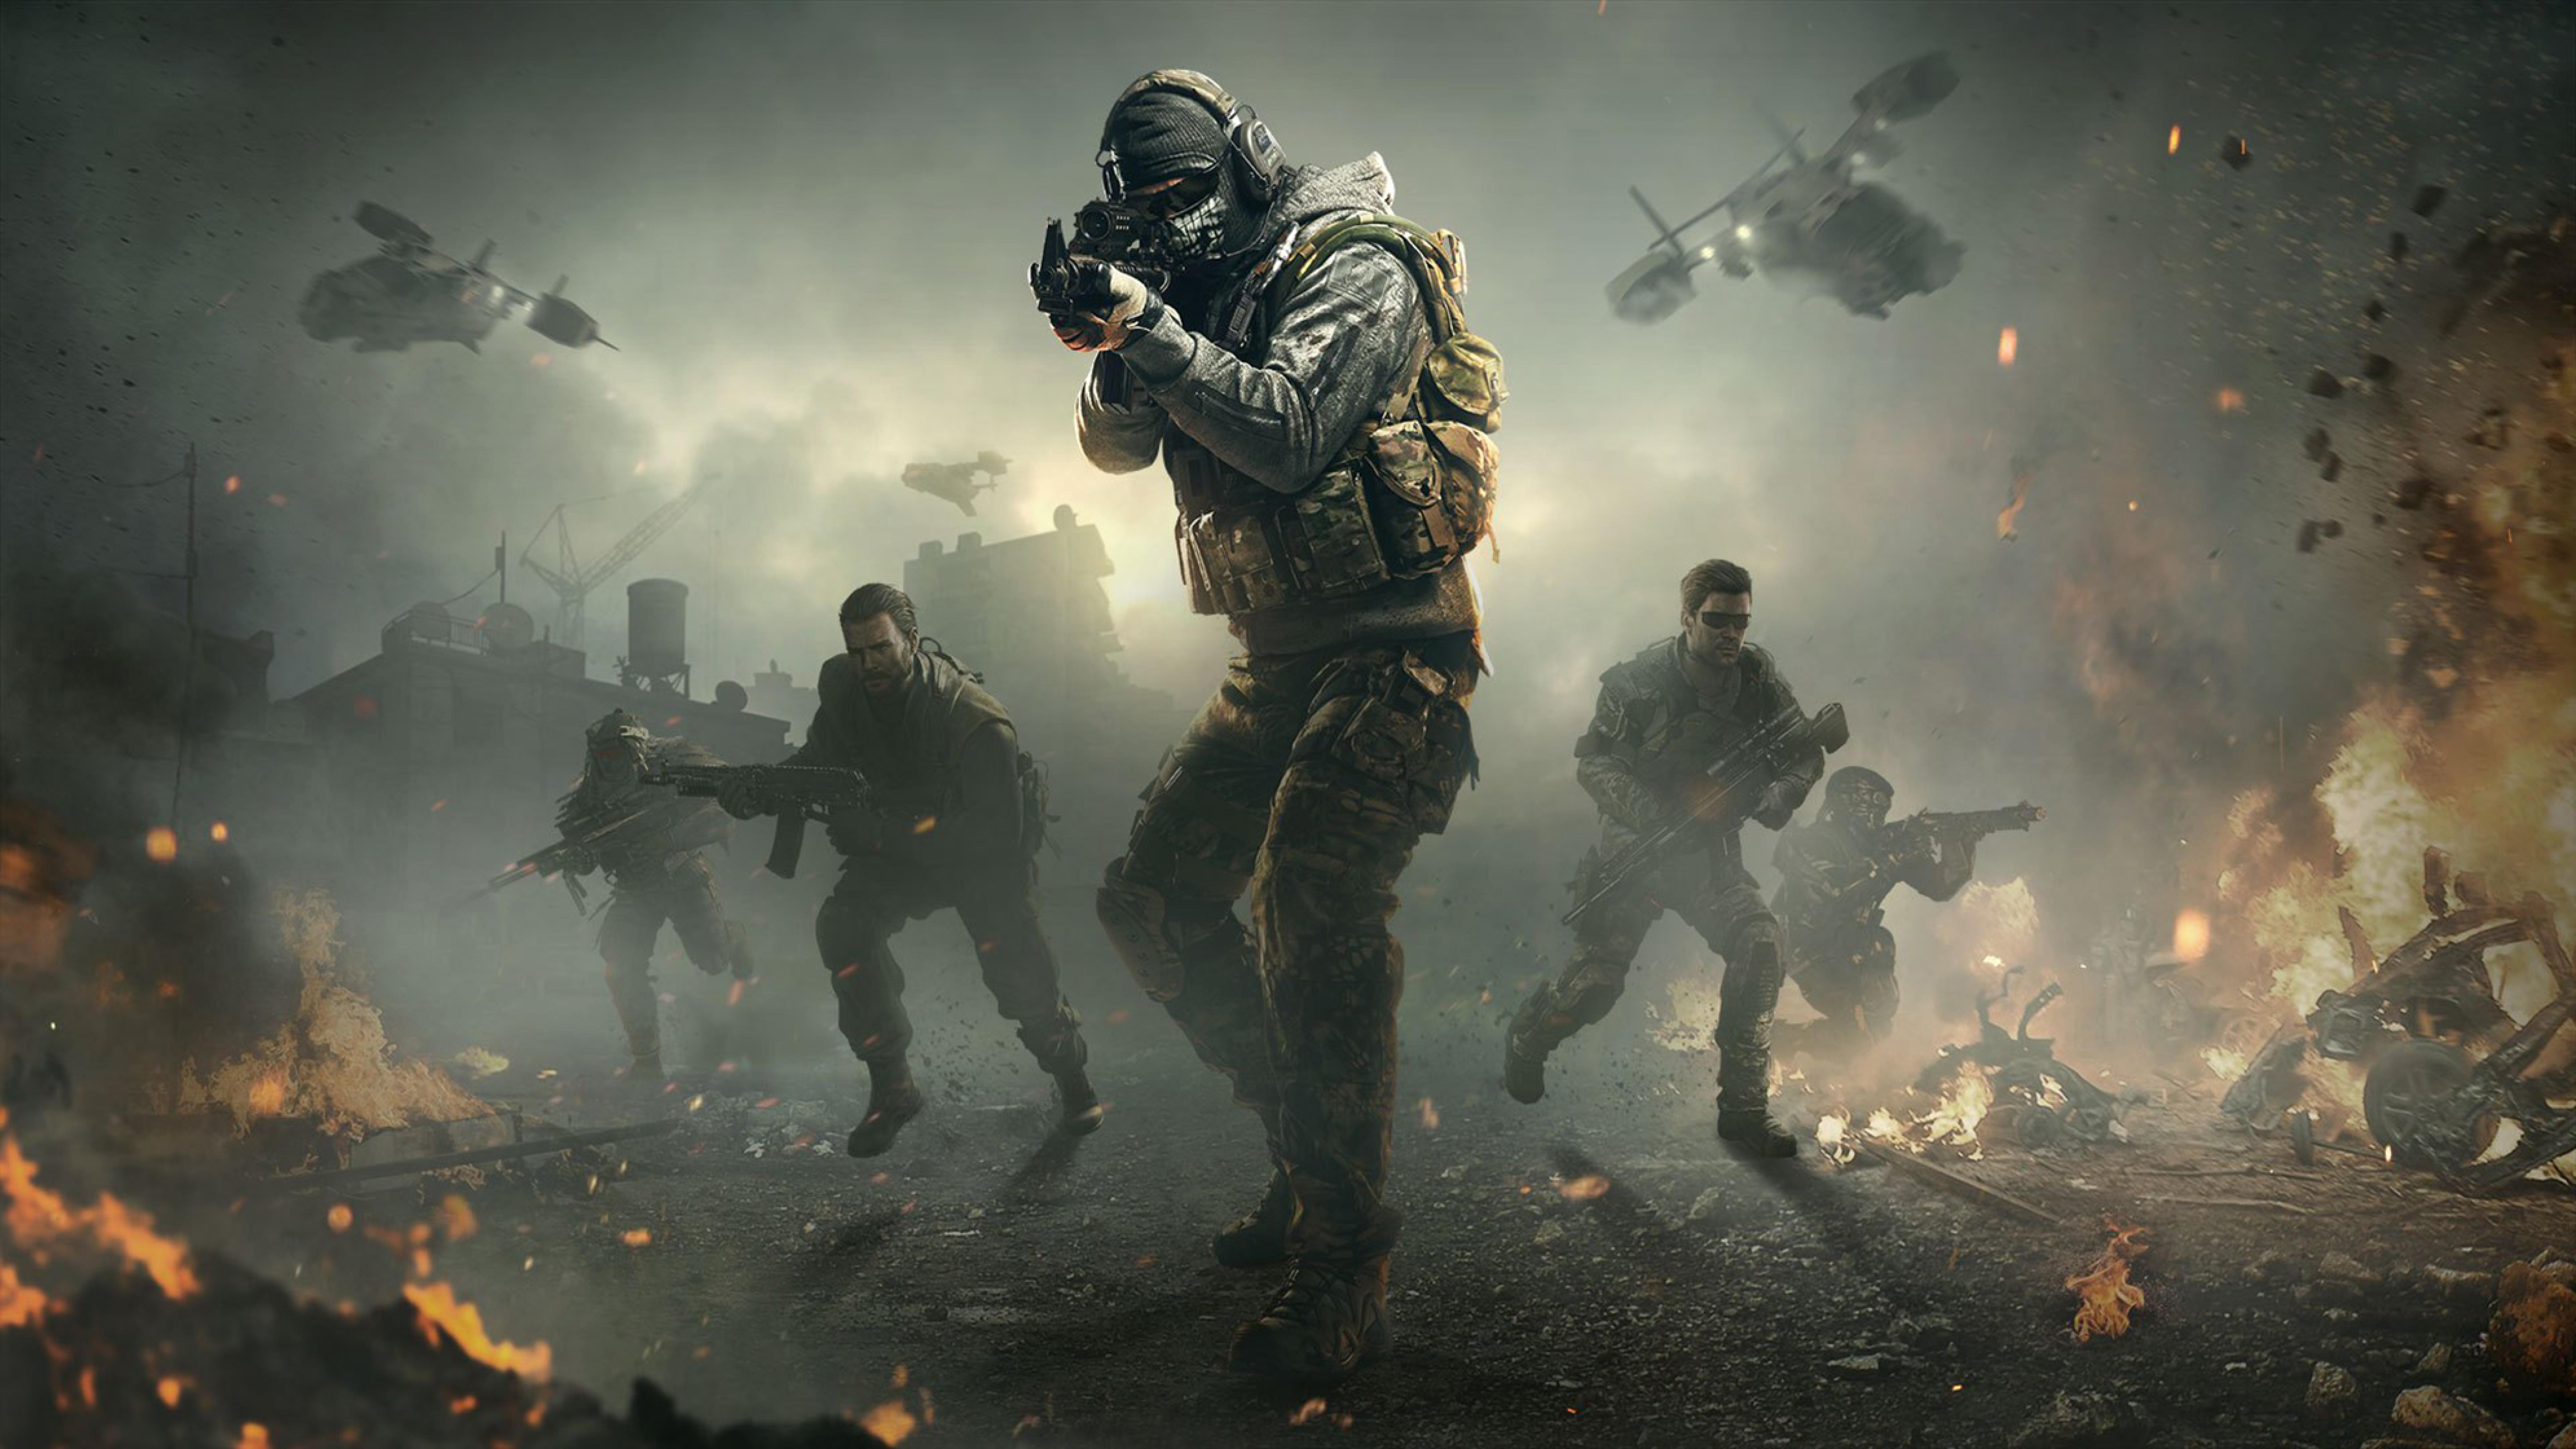 7680x4320 Call Of Duty Mobile 2019 8k Wallpaper Hd Games 4k